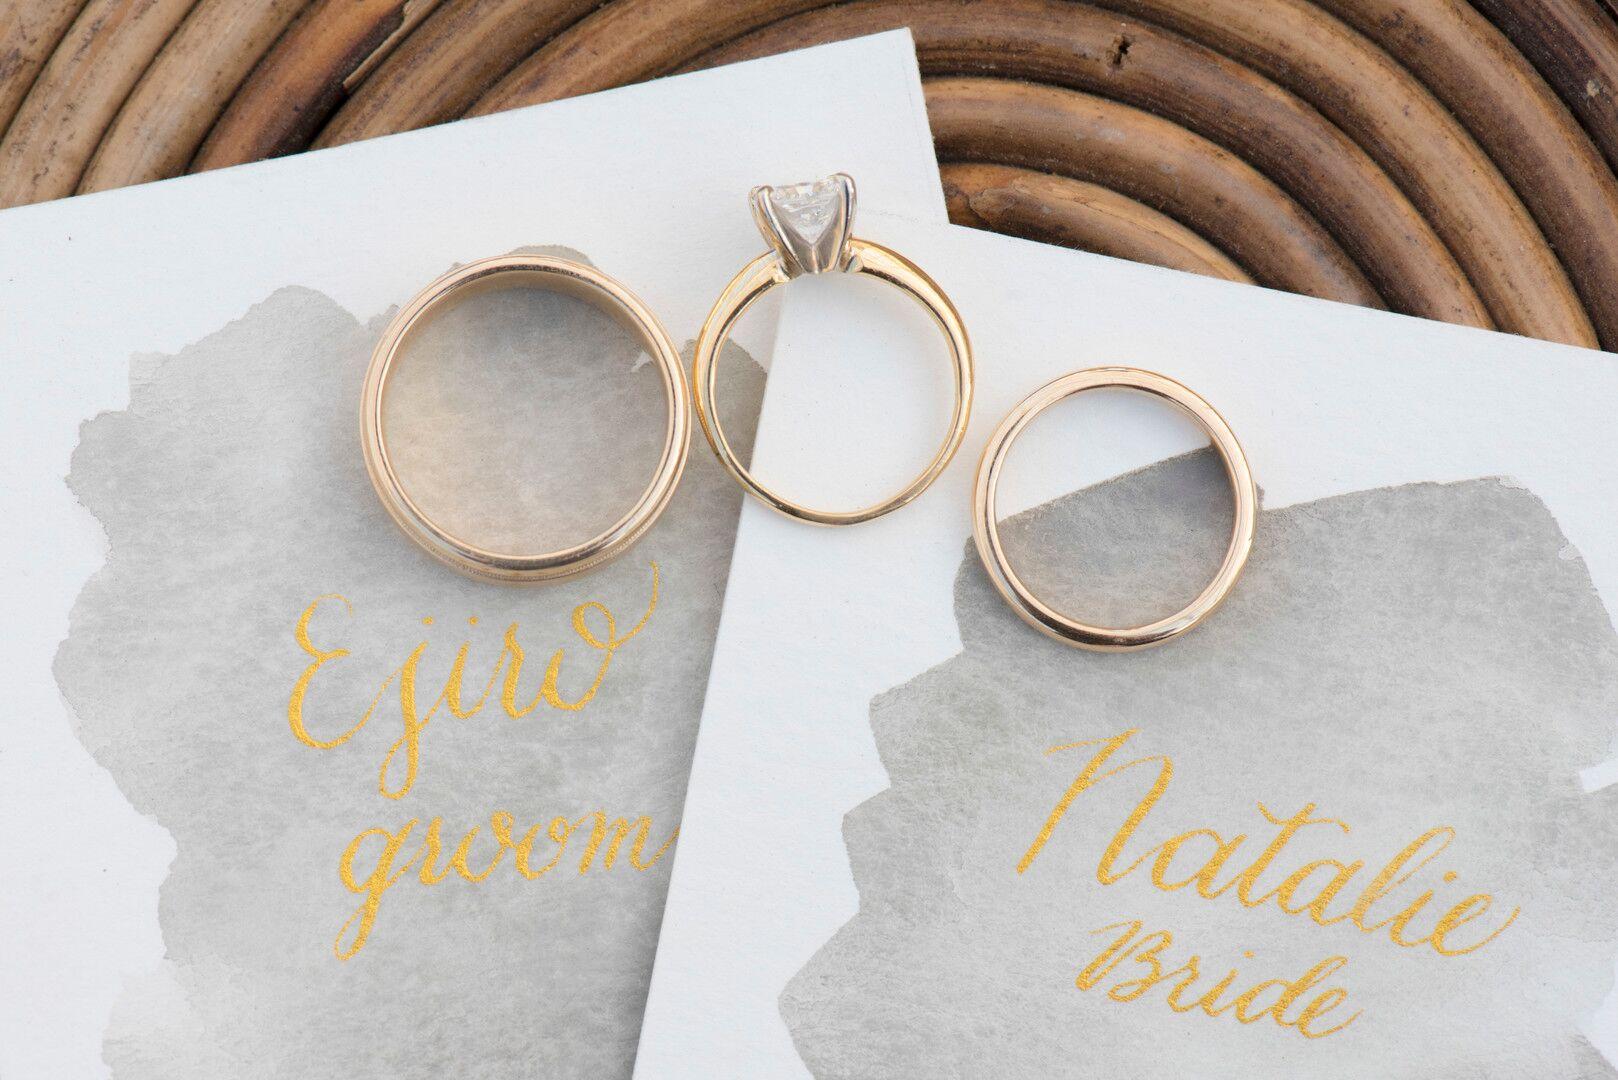 www.santabarbarawedding.com | Venue: Dos Pueblos Ranch | Photographer: ByCherry Photography | Event Designer: Elan Event Rentals | Calligrapher: Jessica Yee Calligraphy | Wedding Rings